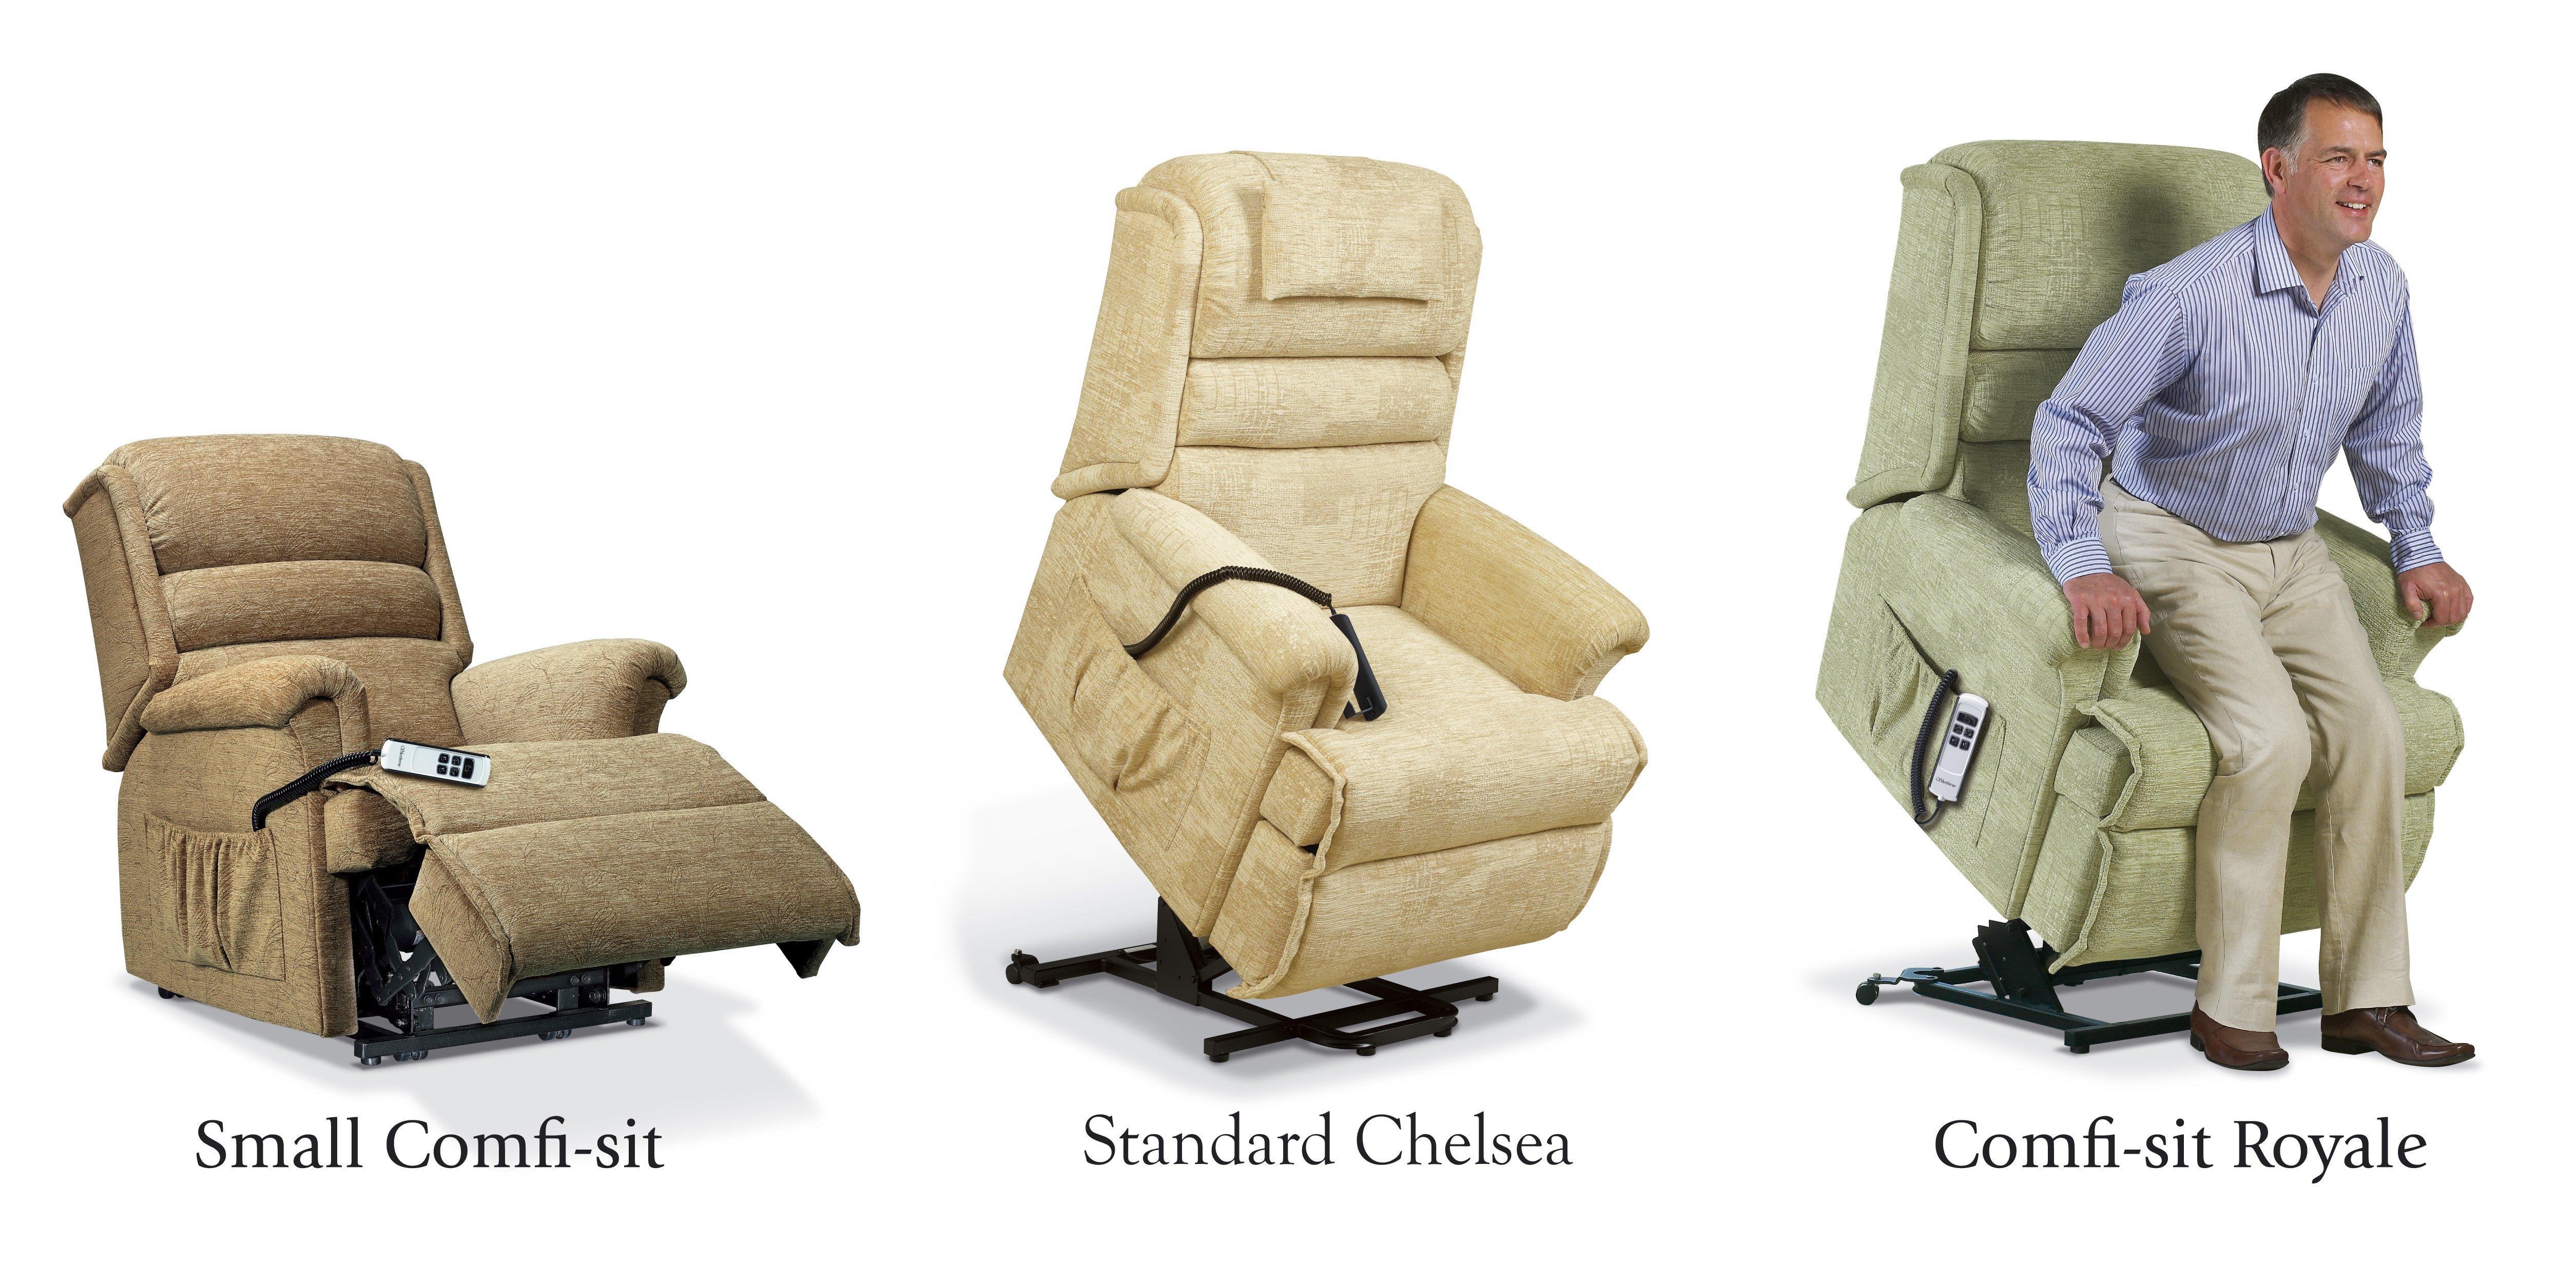 Chelsea and Comfi-Sit Range